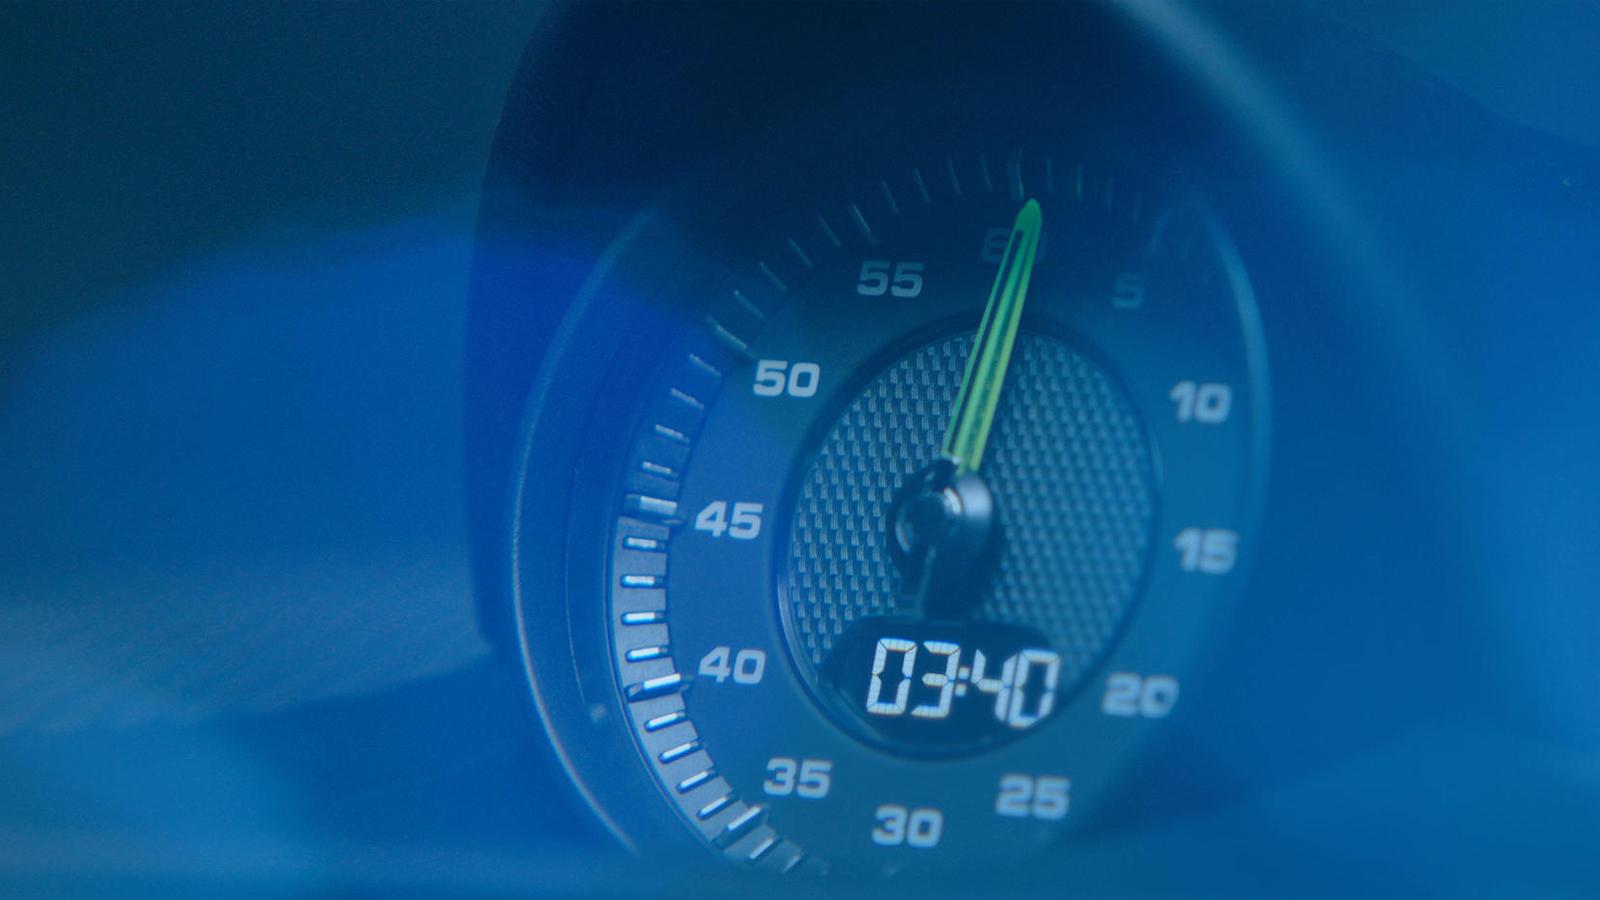 Porsche 3,4 secondes